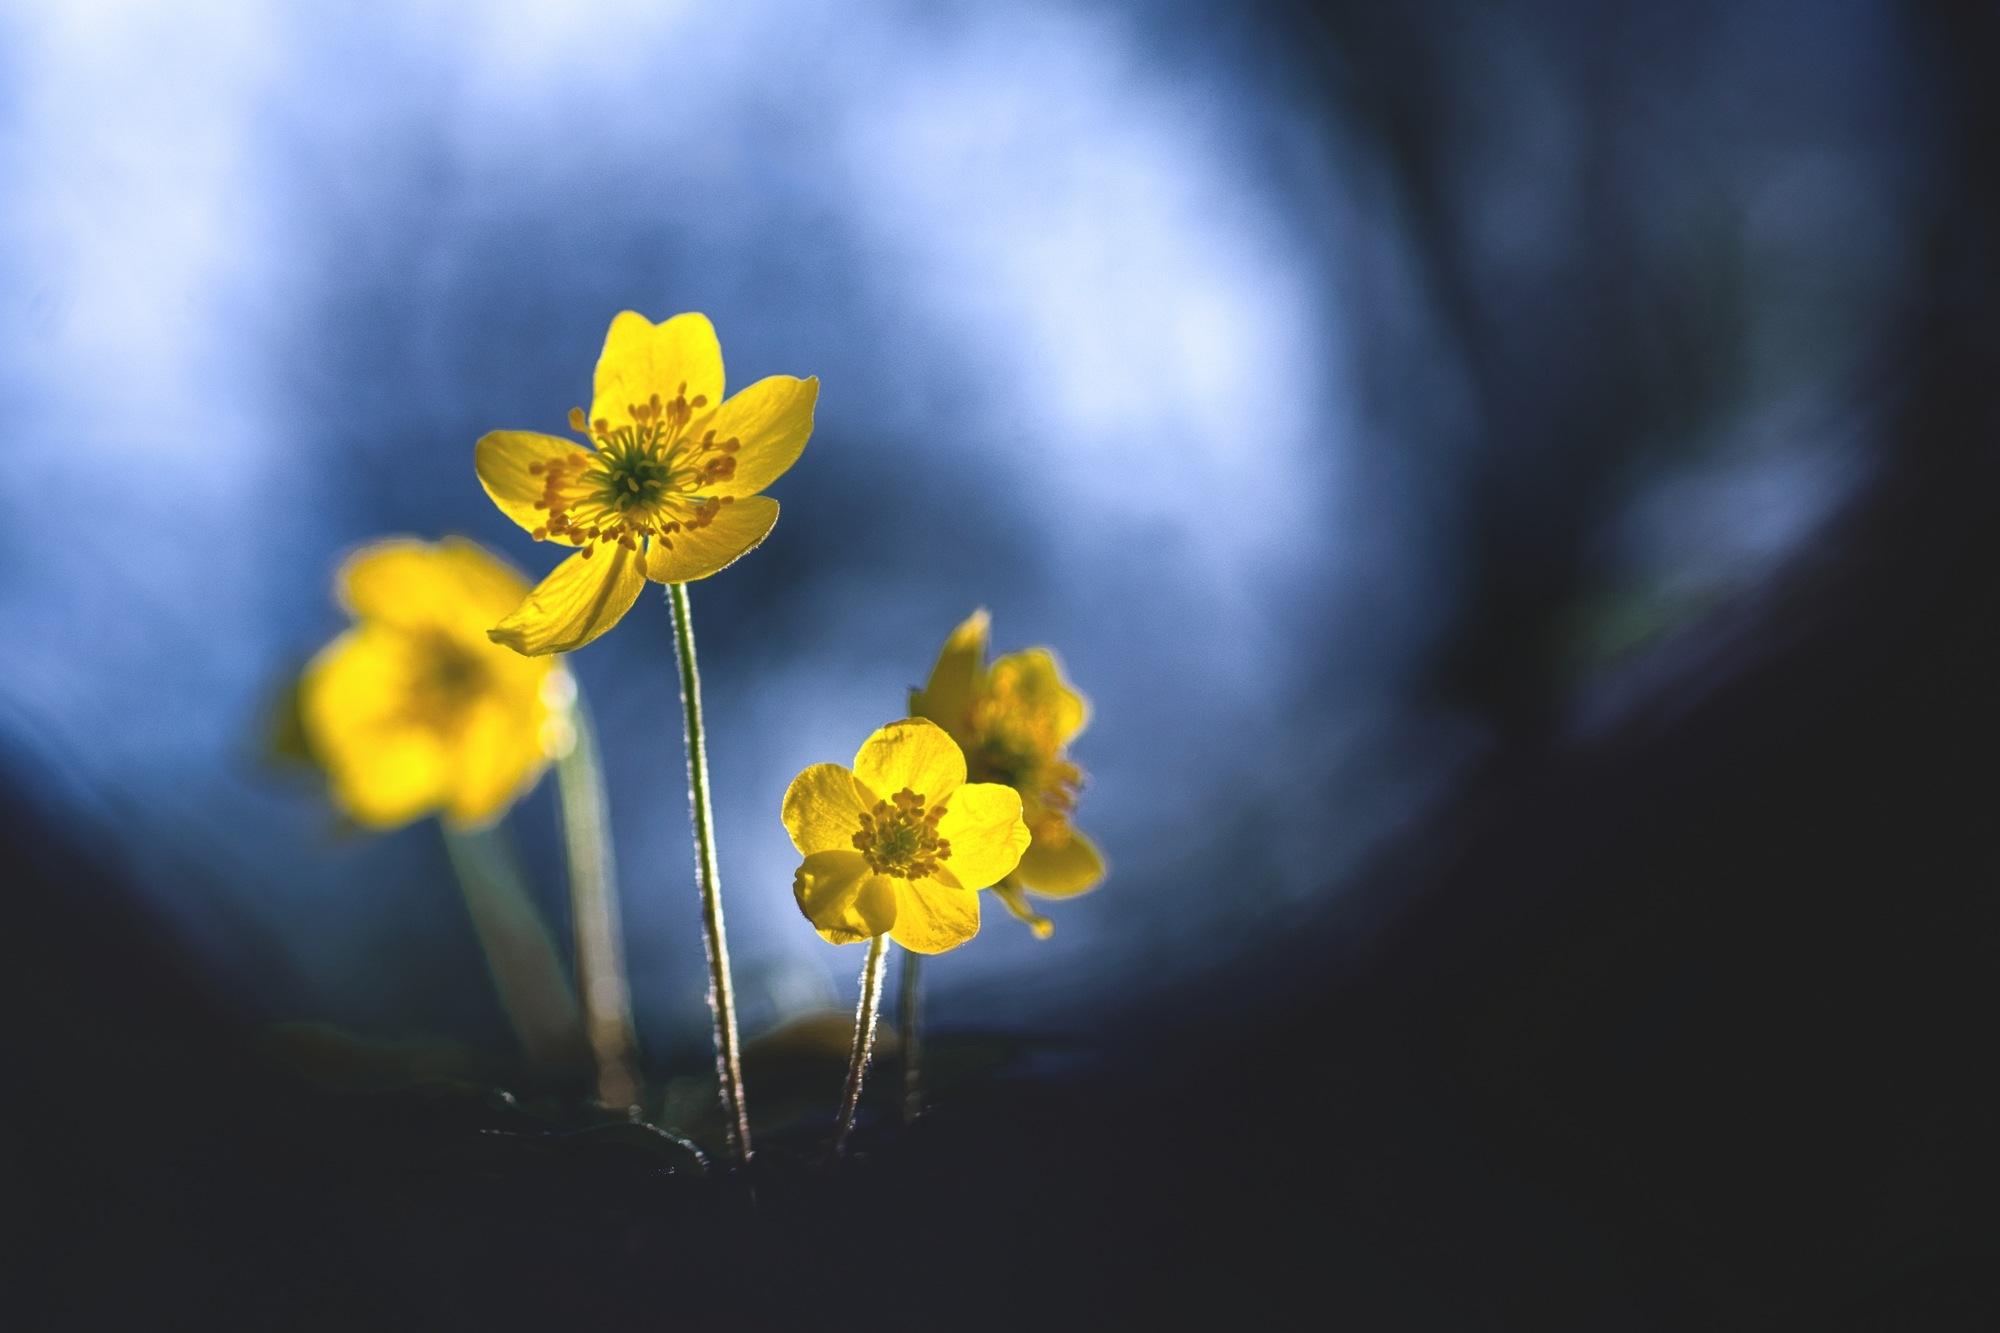 Sunny flower by donlope